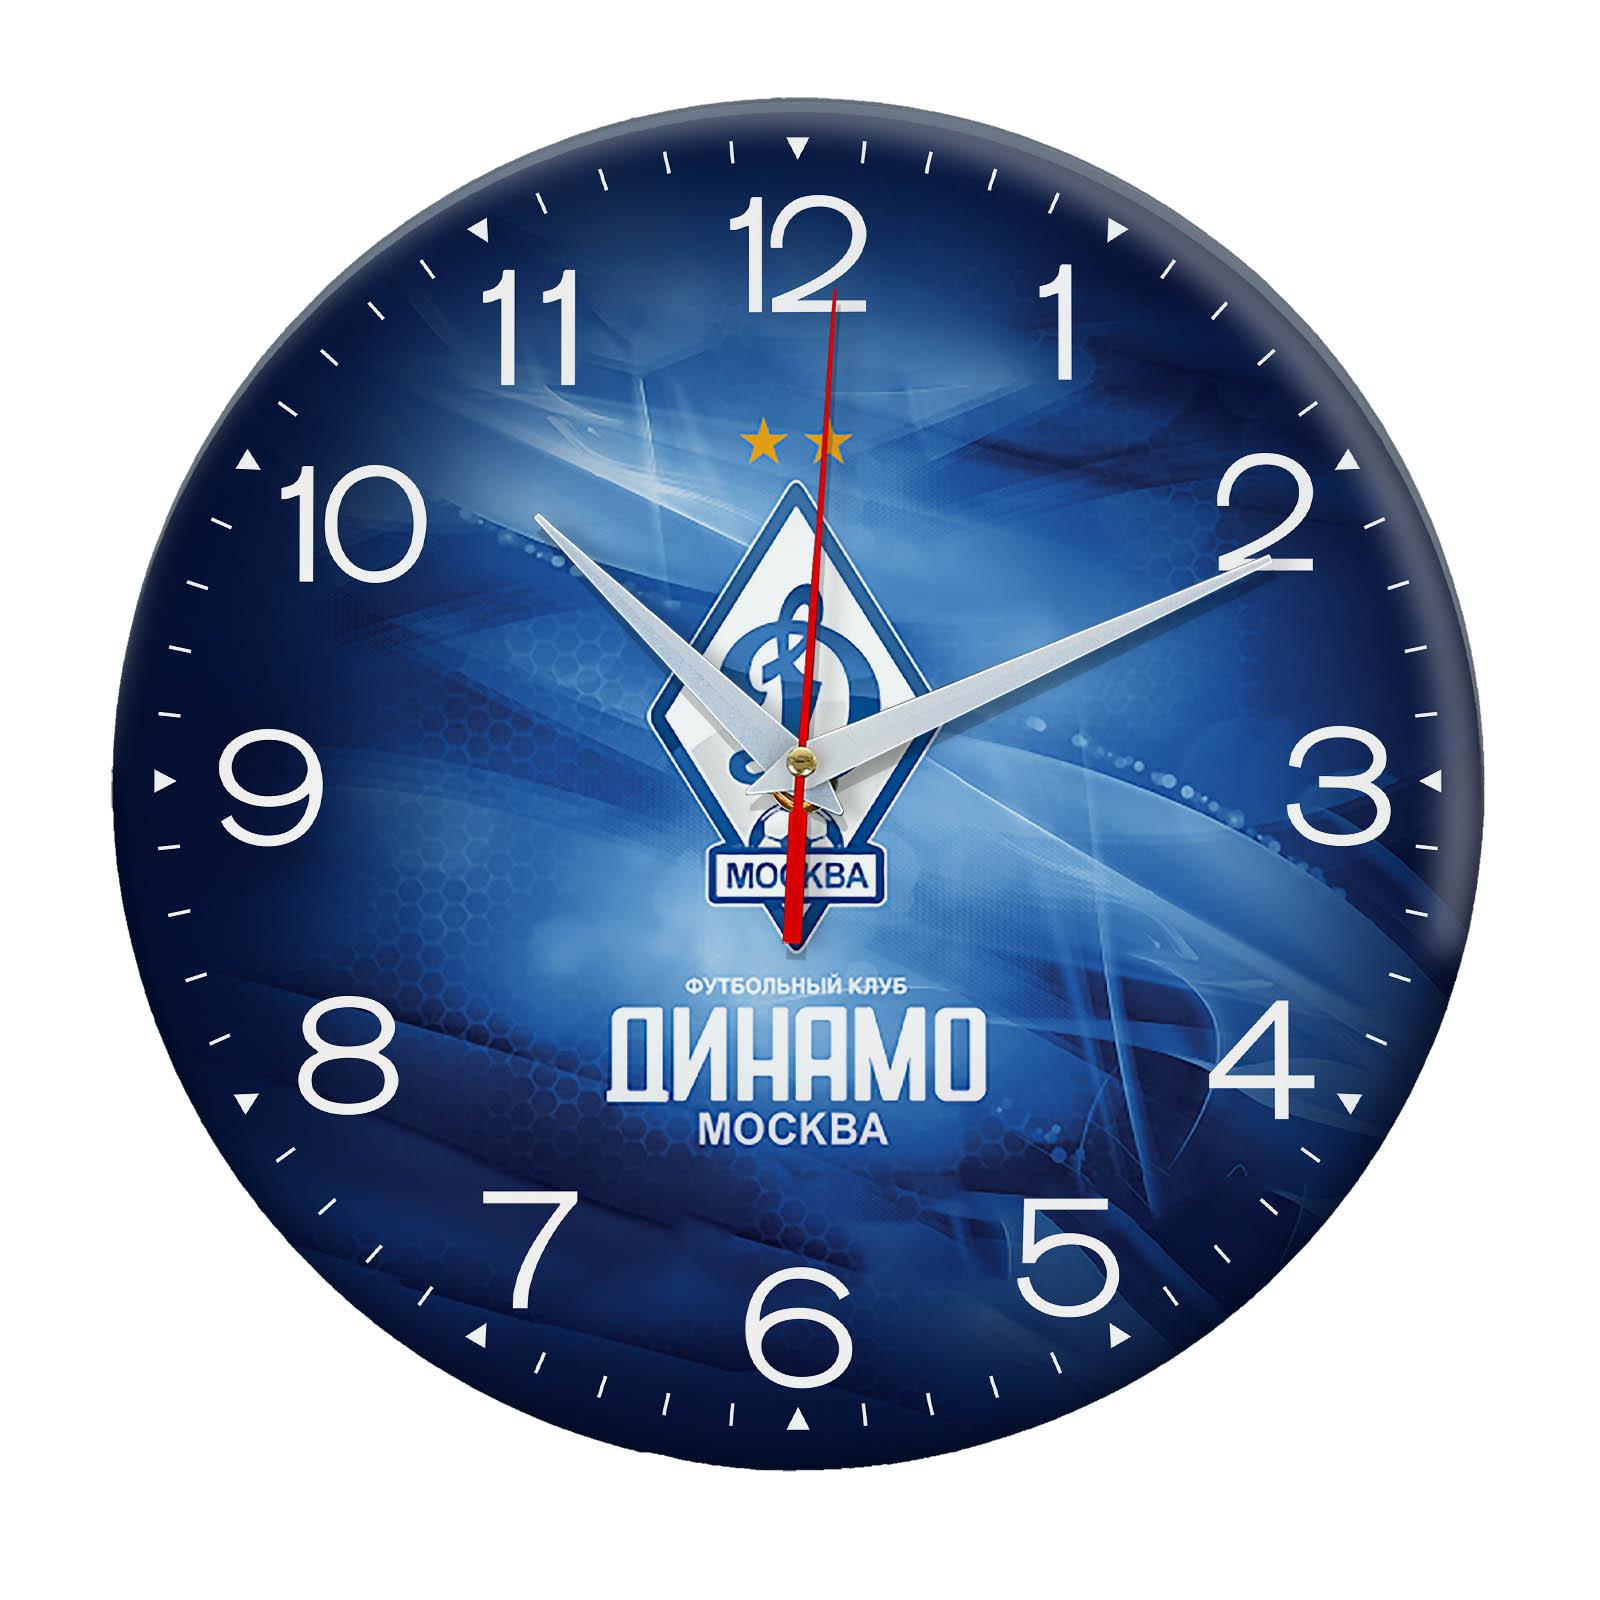 dinamo_moskva_01_0014_temn-krug